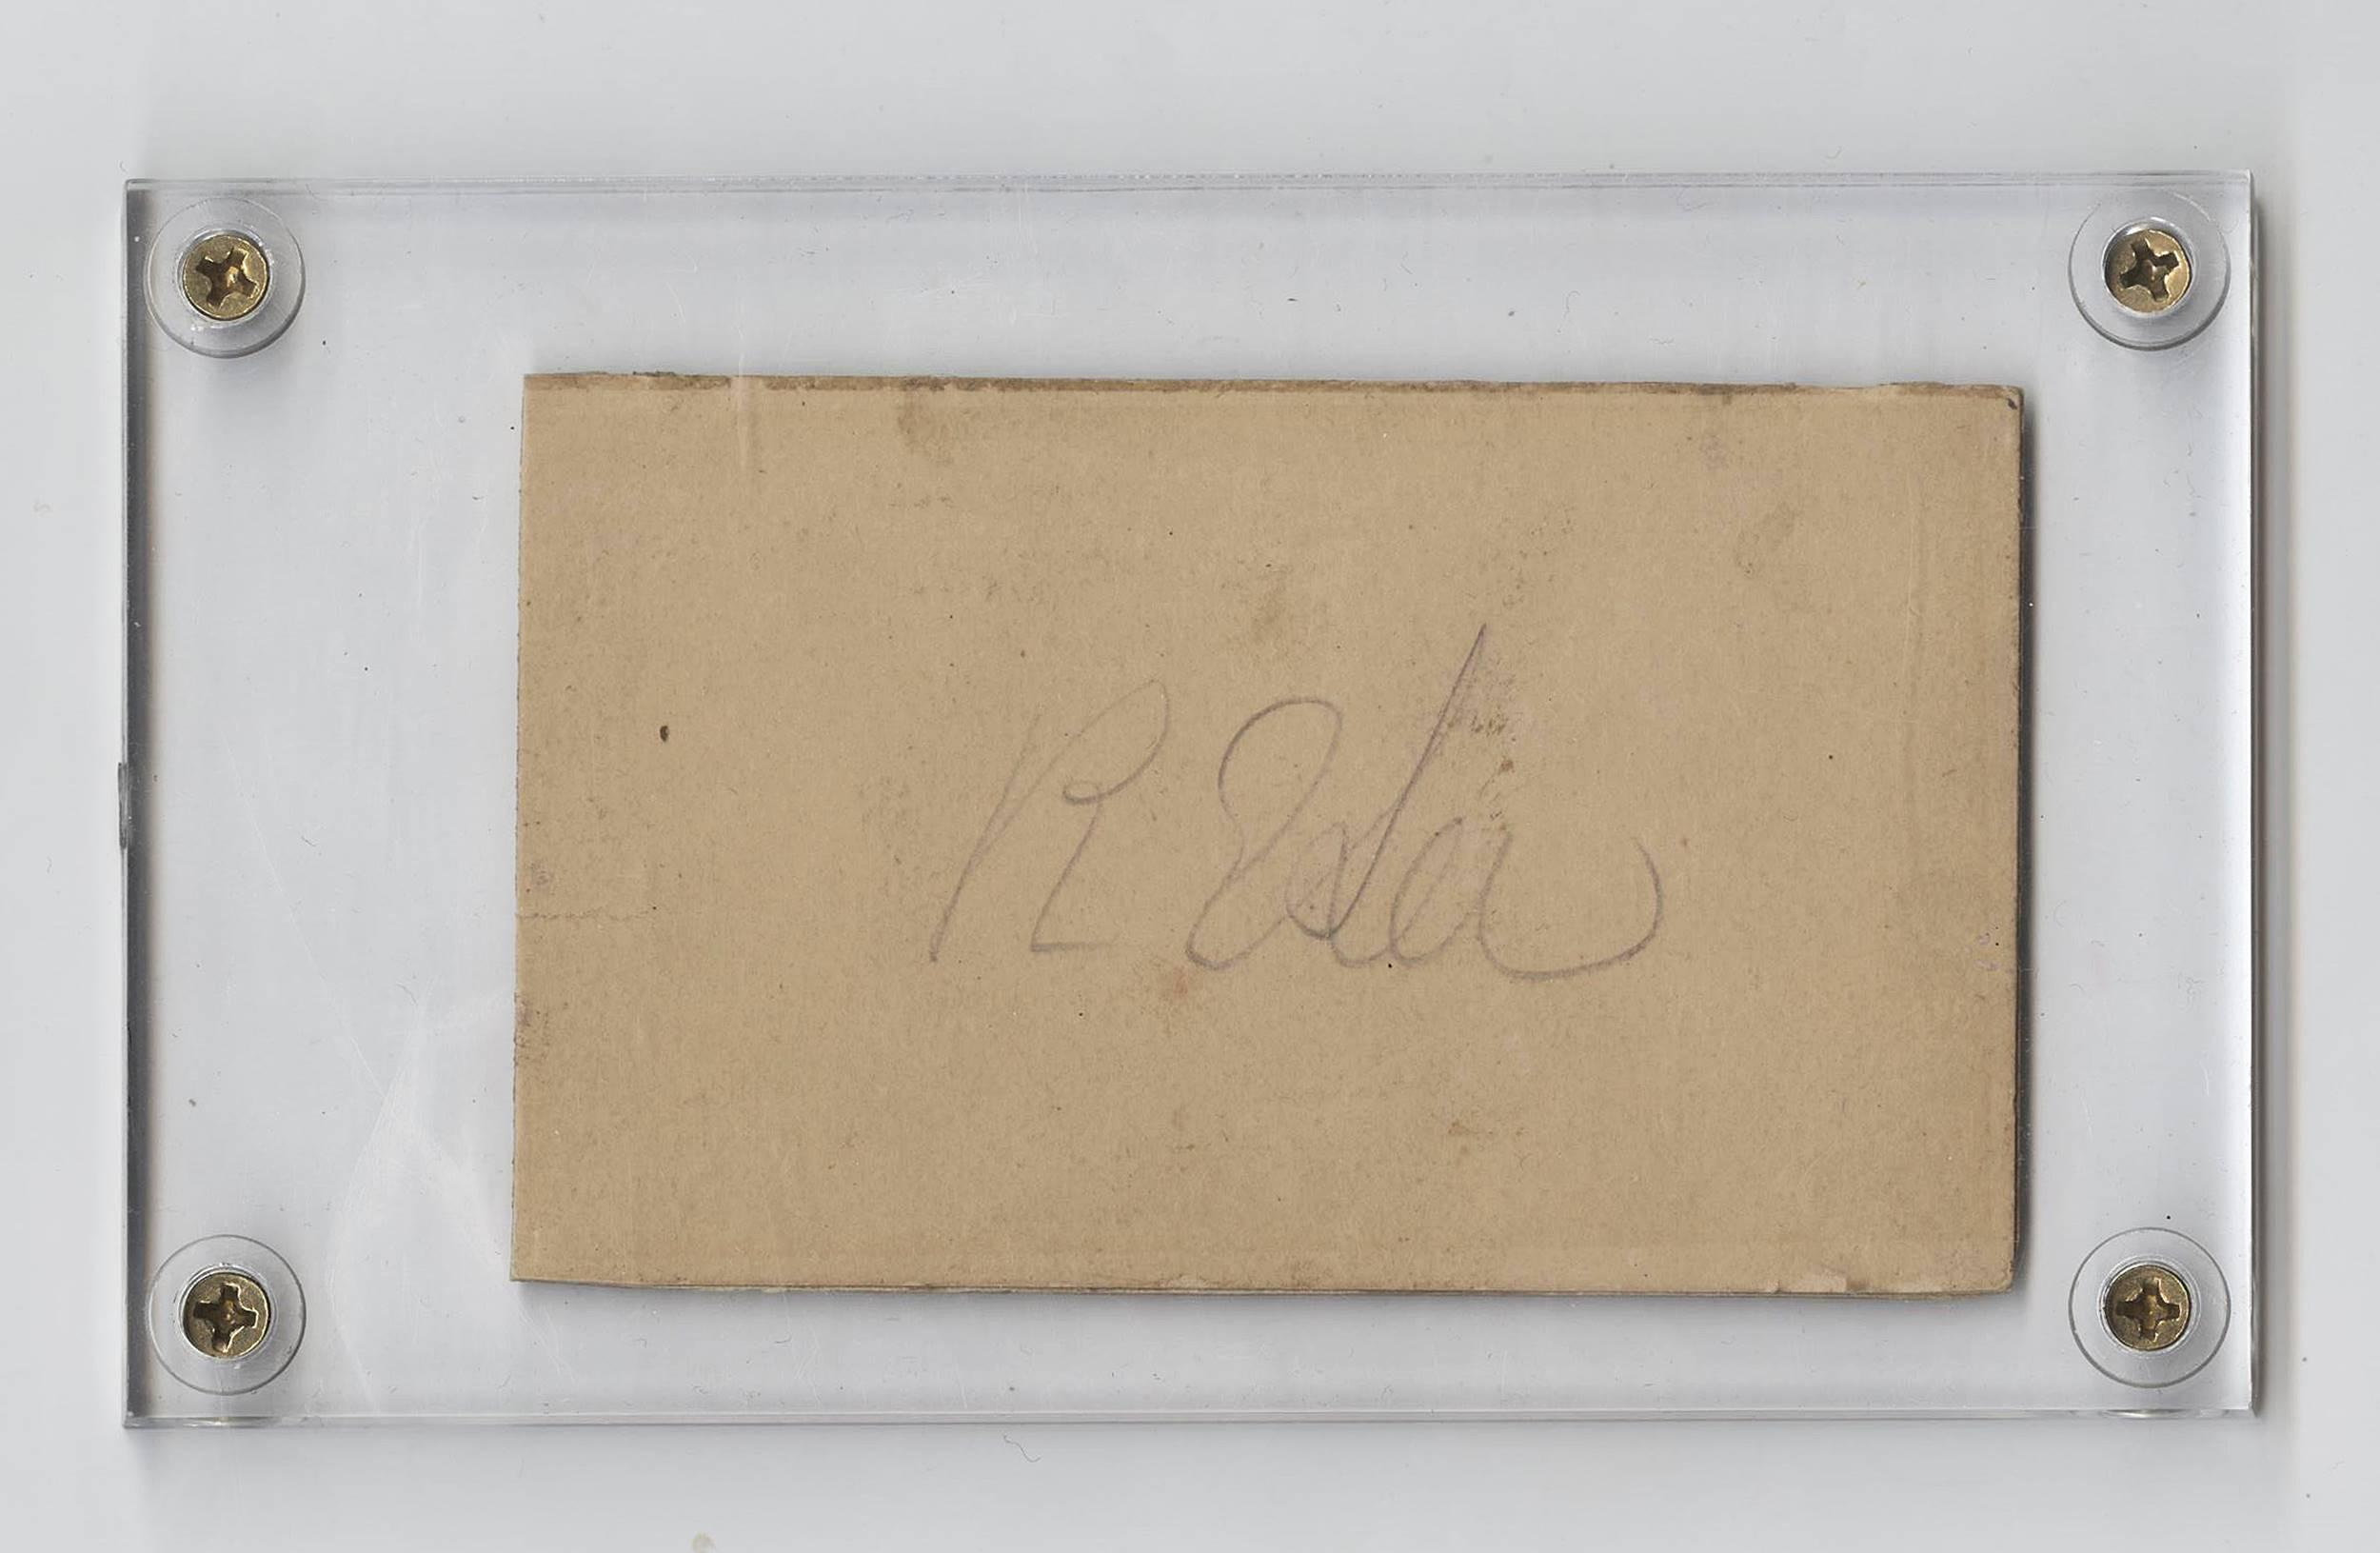 Robert E. Lee Signature in Lovely Case